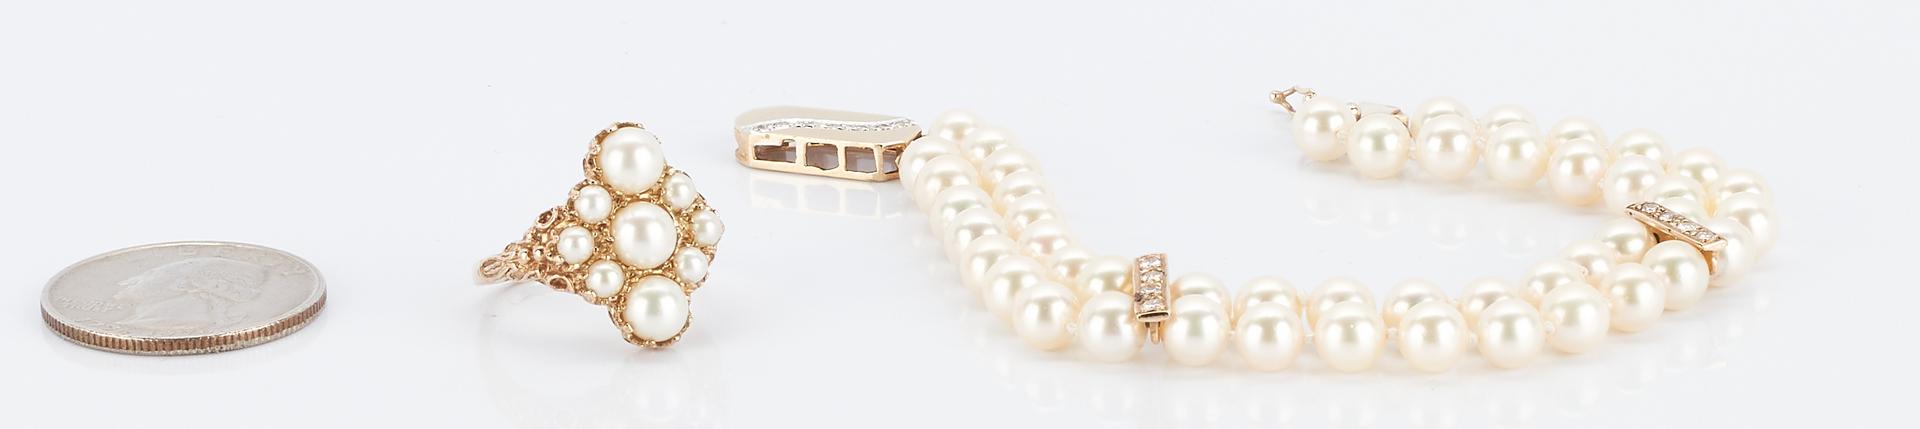 Lot 931: Double Strand Pearl Bracelet & Pearl Ring